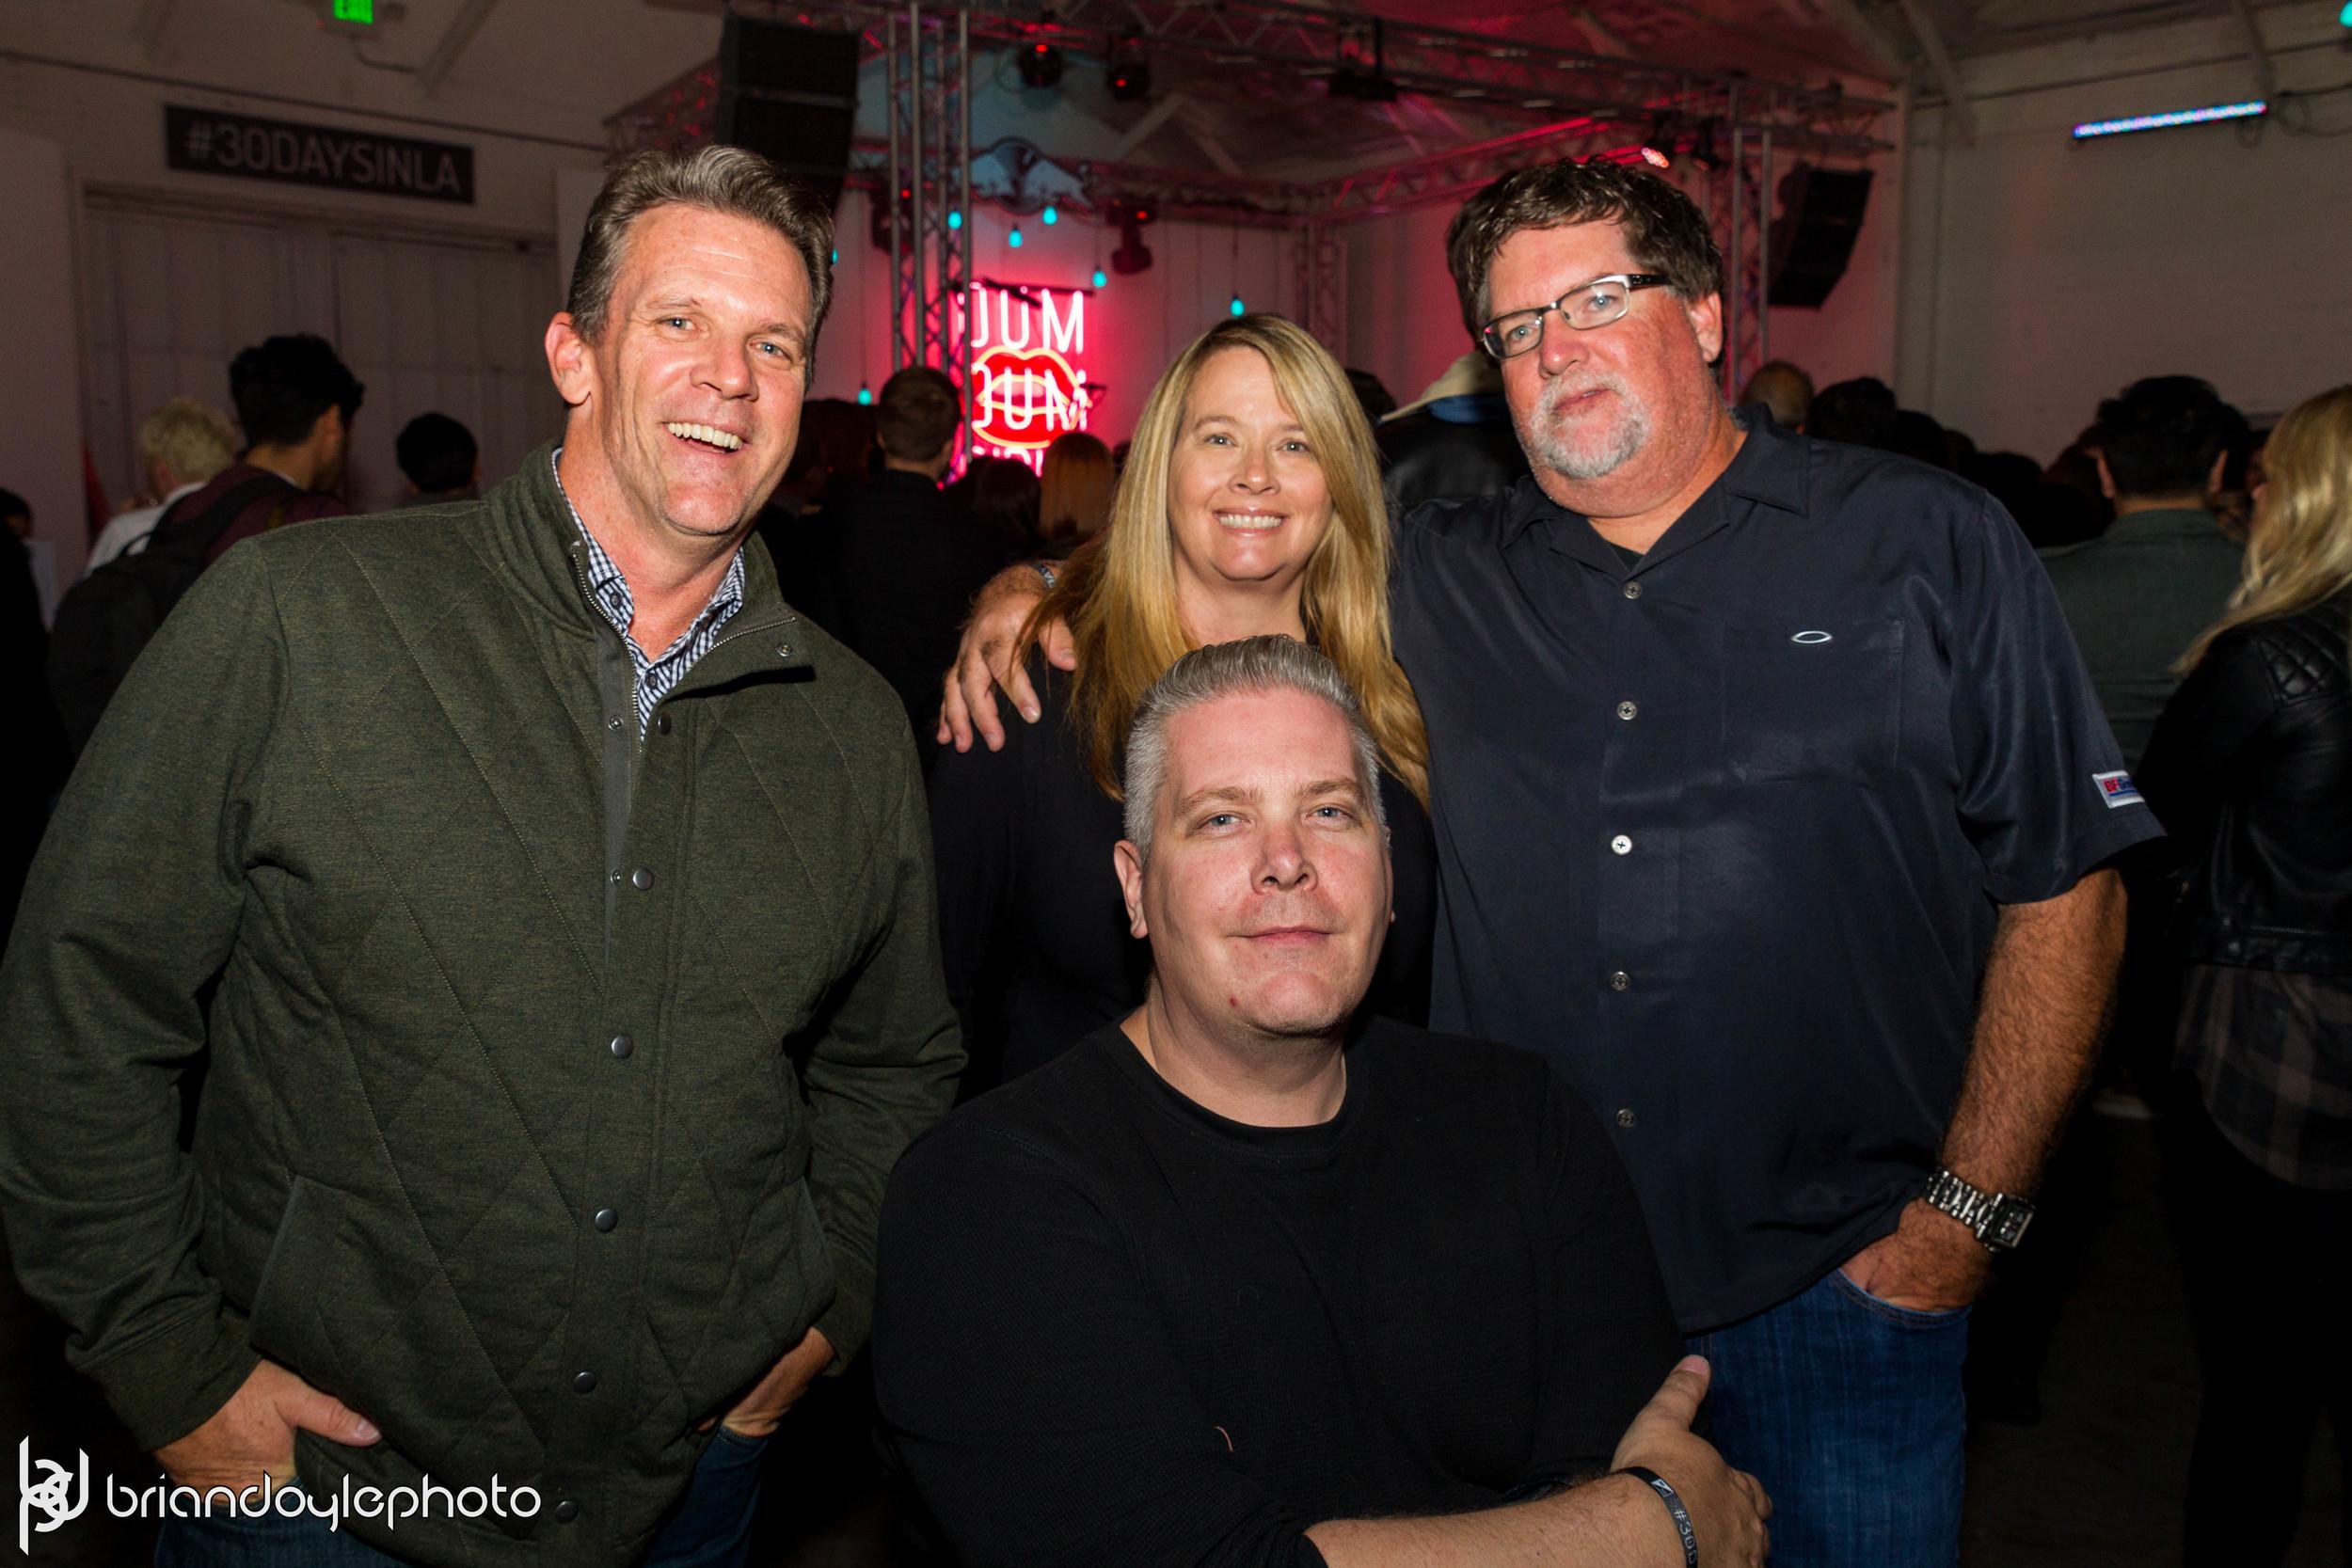 Red Bull - Dum Dum Girls, Tropicana and the Flea, Lowell @ The Well 2014.11.16-42.jpg